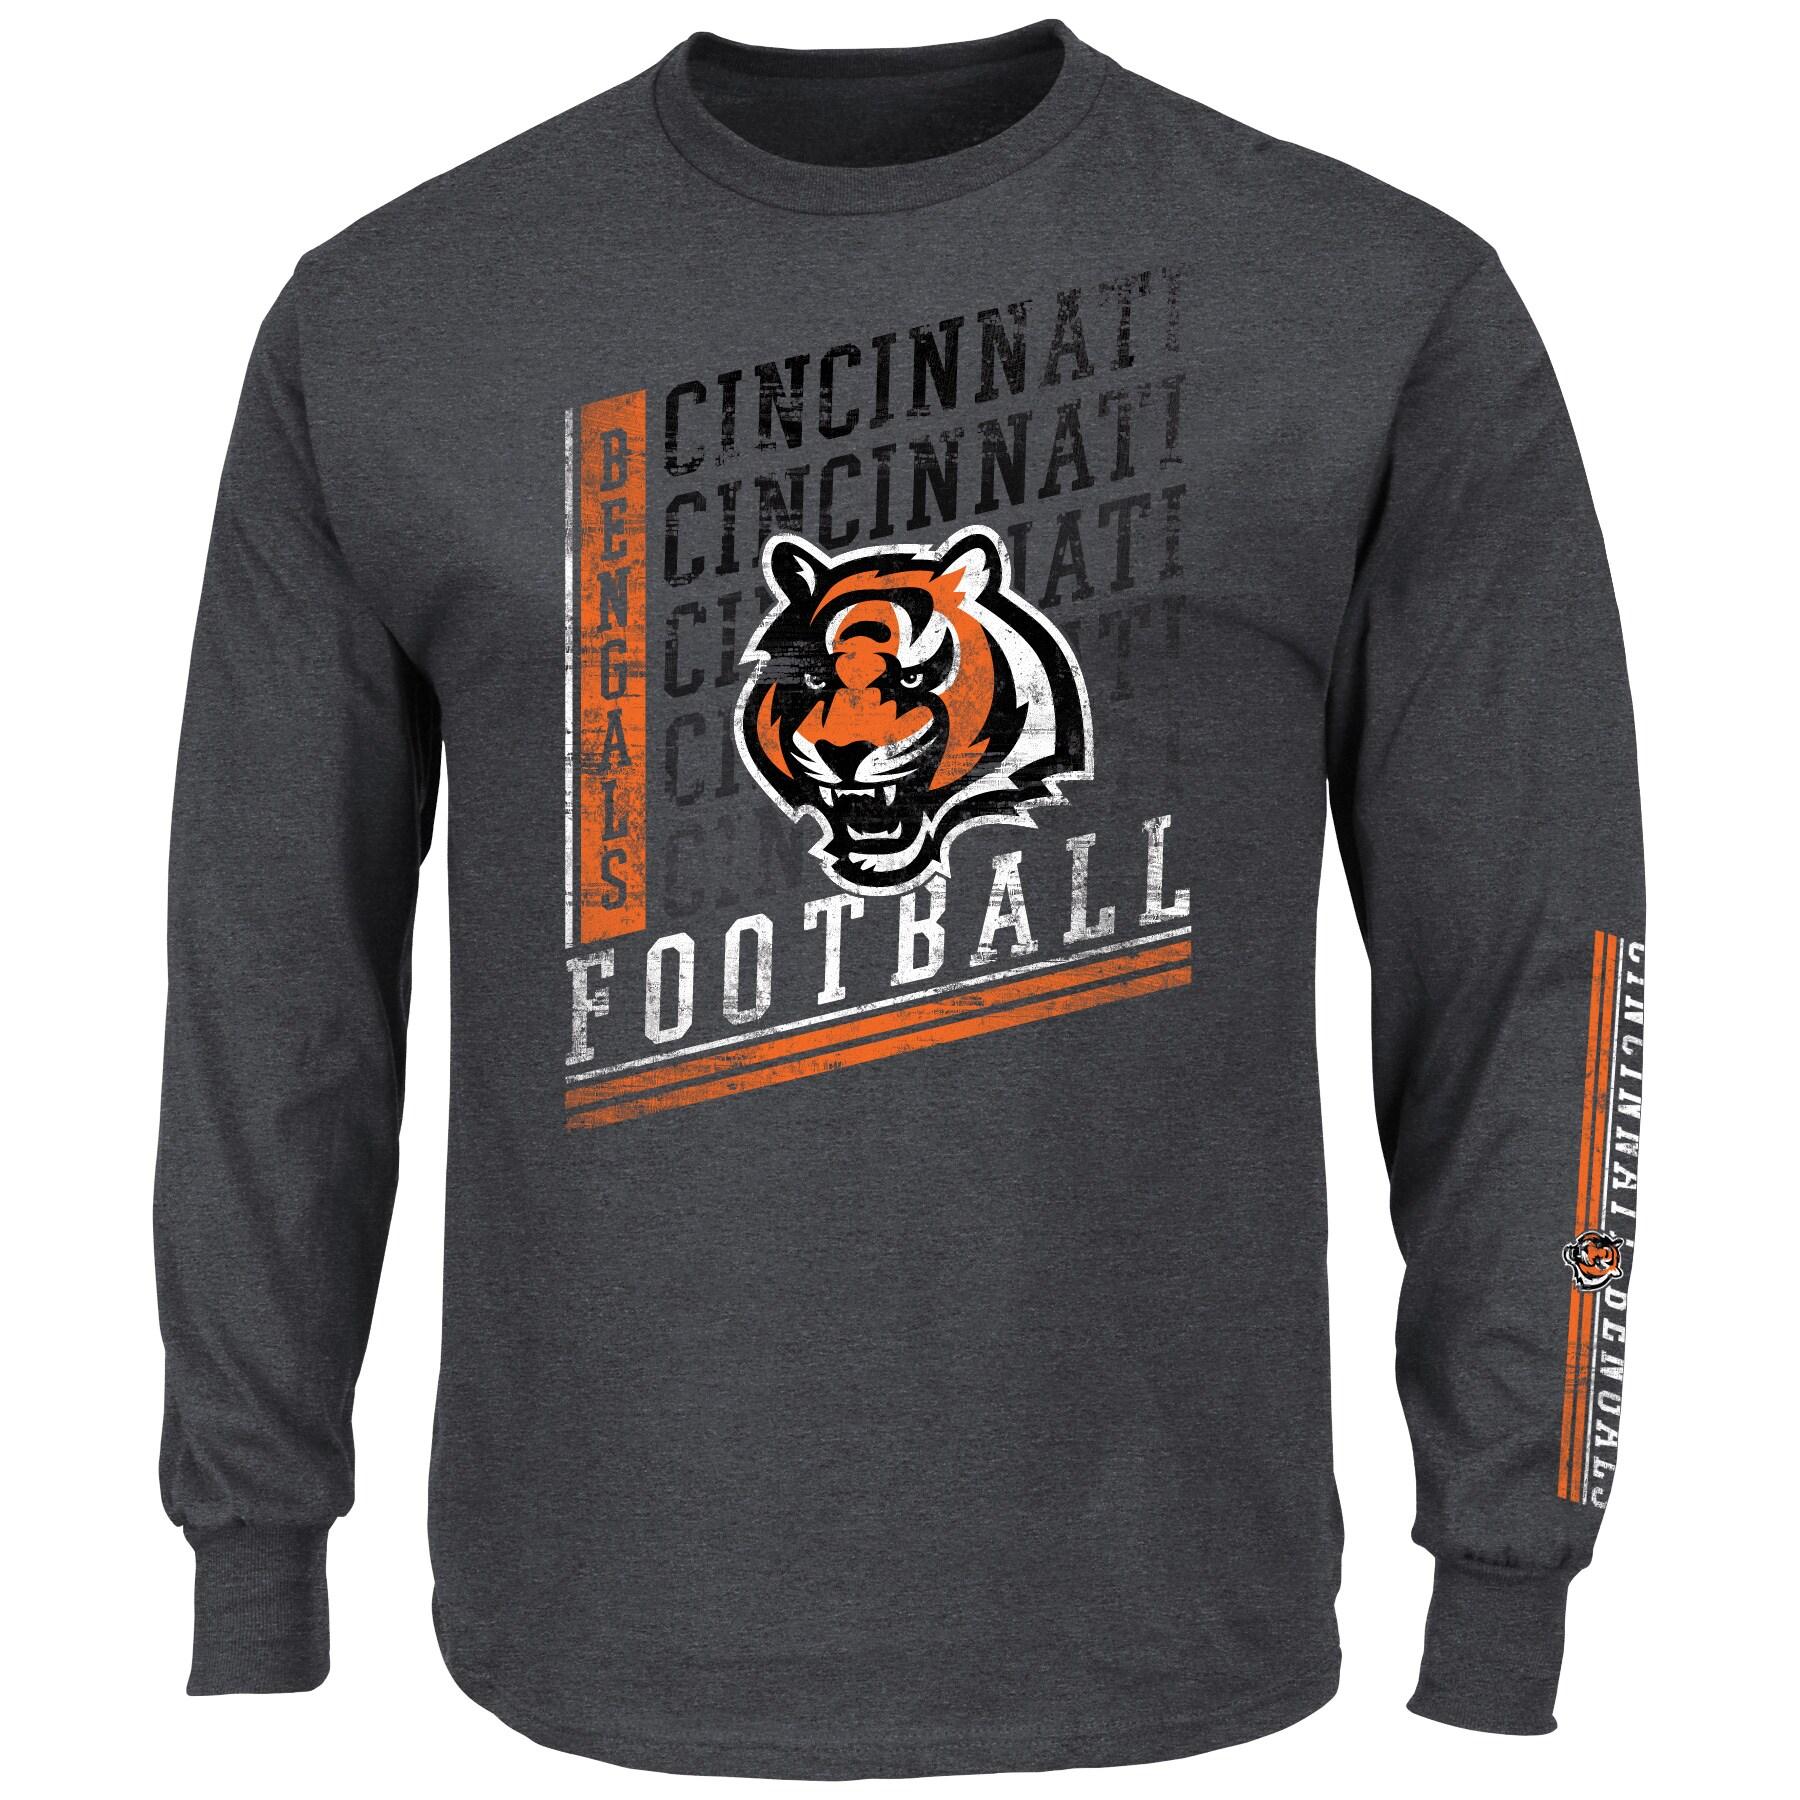 Cincinnati Bengals Majestic Big & Tall Dual Threat Long Sleeve T-Shirt - Charcoal